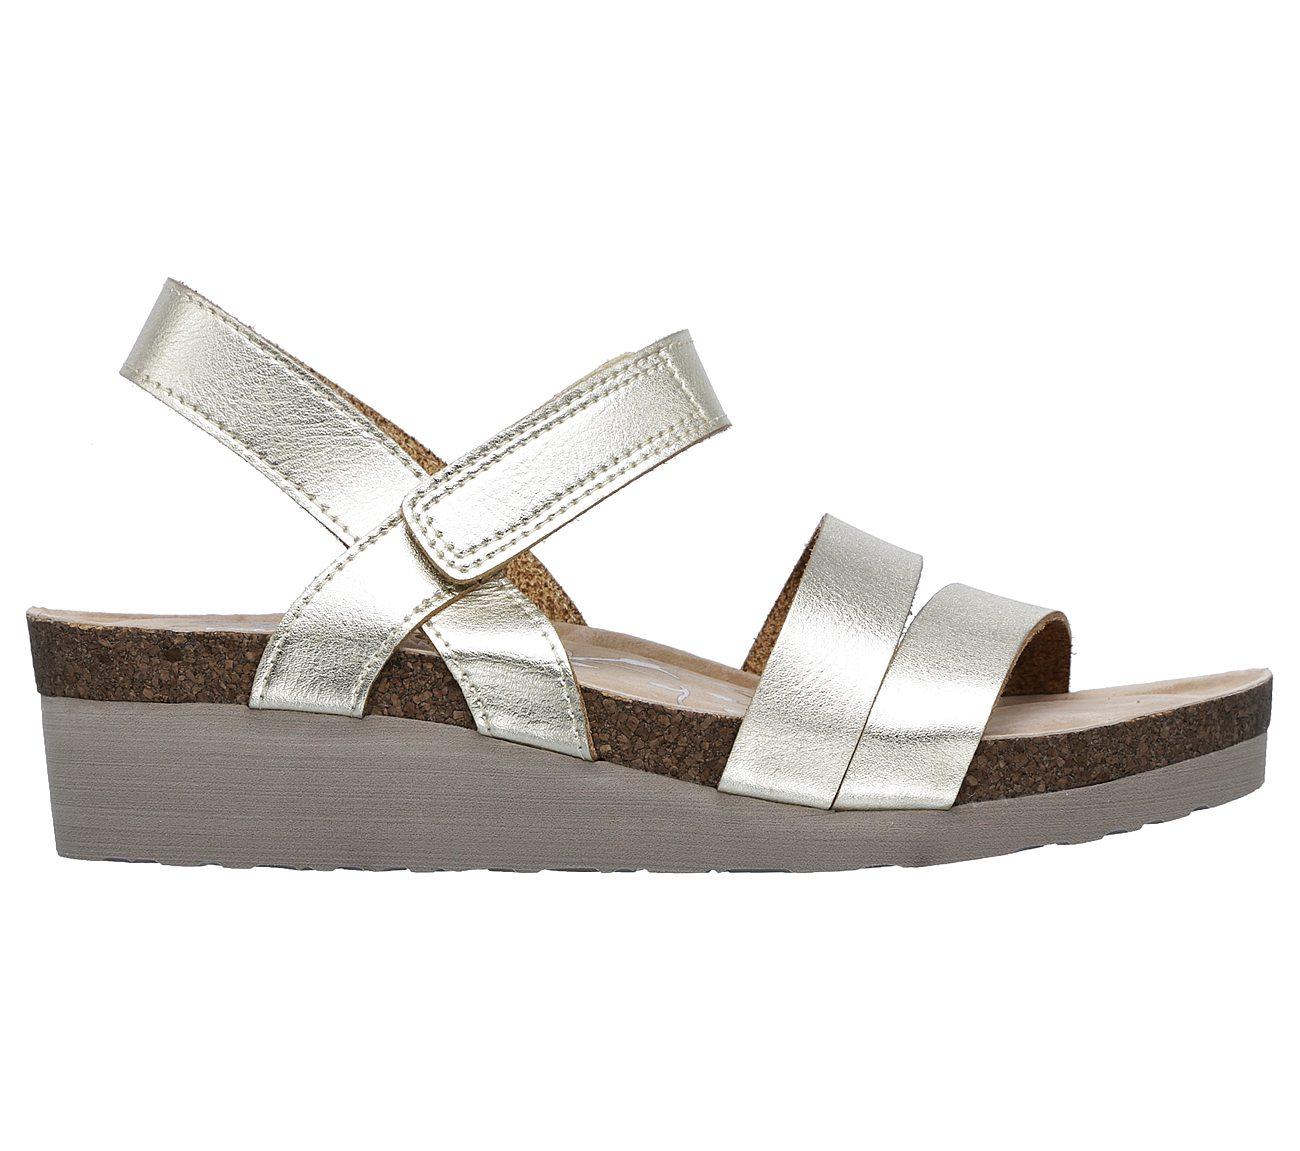 52380d8d93d5 Buy SKECHERS Troos - Brons Modern Comfort Shoes only  60.00